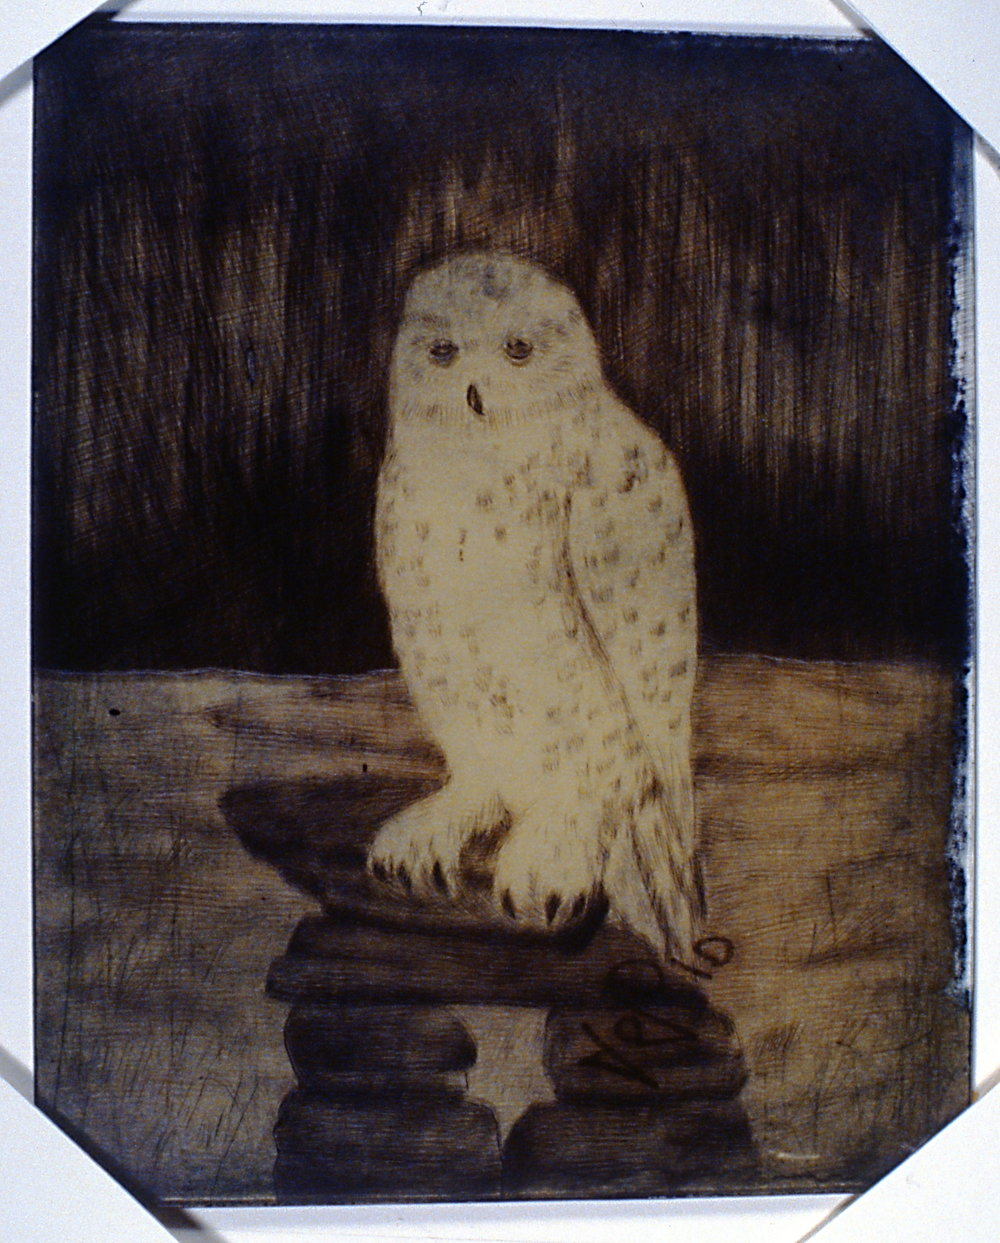 Snowy Owl, 1992, Minn Sjløseth, plastic etching plate, 30 x 24cm, 1996.02.02